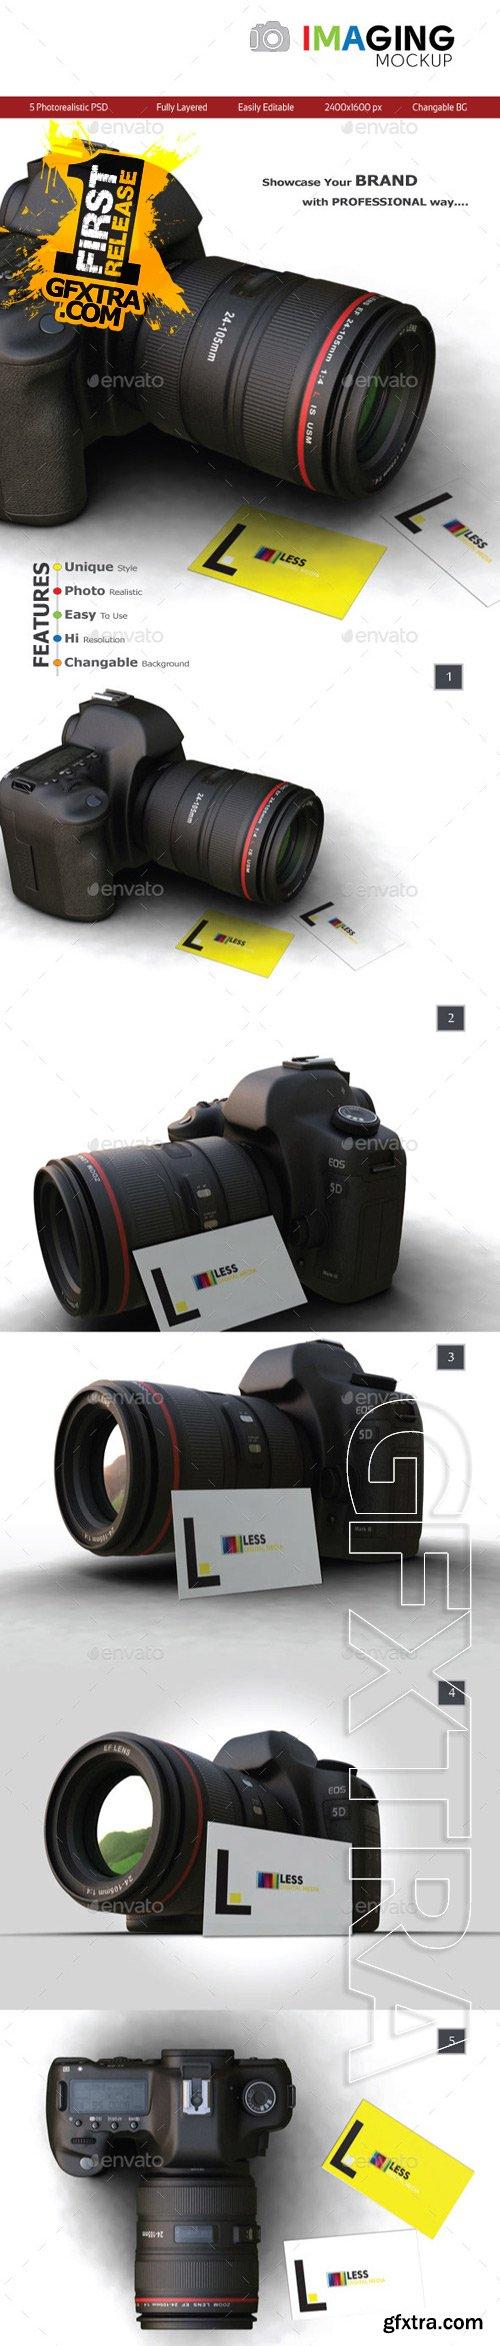 GraphicRiver - Imaging Mockup 10550736